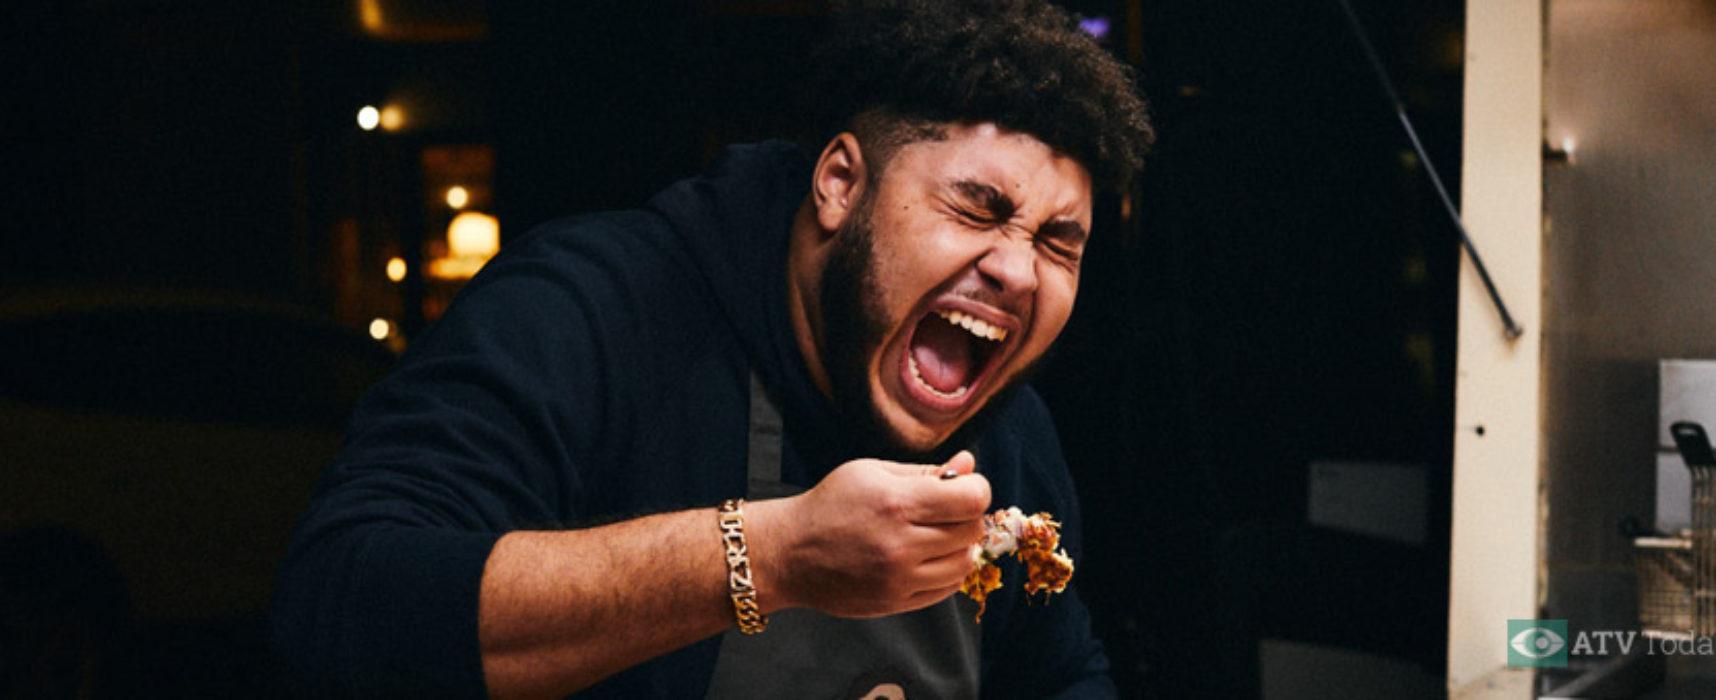 UKTV combines comedy and cooking with DJ Big Zuu